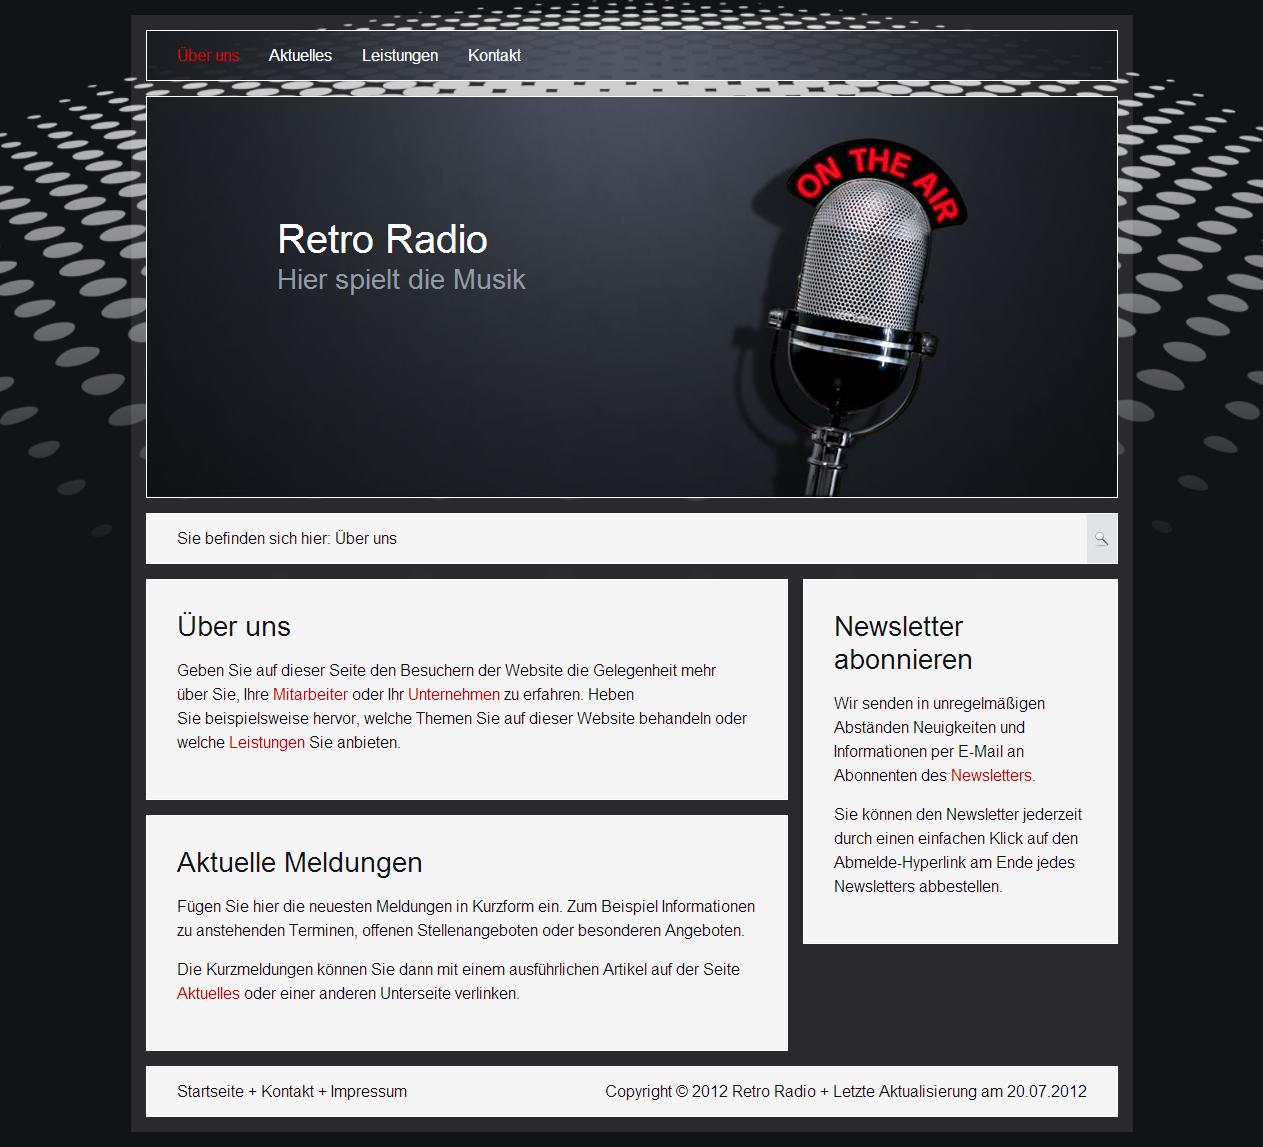 firma homepage erstellen professionelle websites erstellen. Black Bedroom Furniture Sets. Home Design Ideas